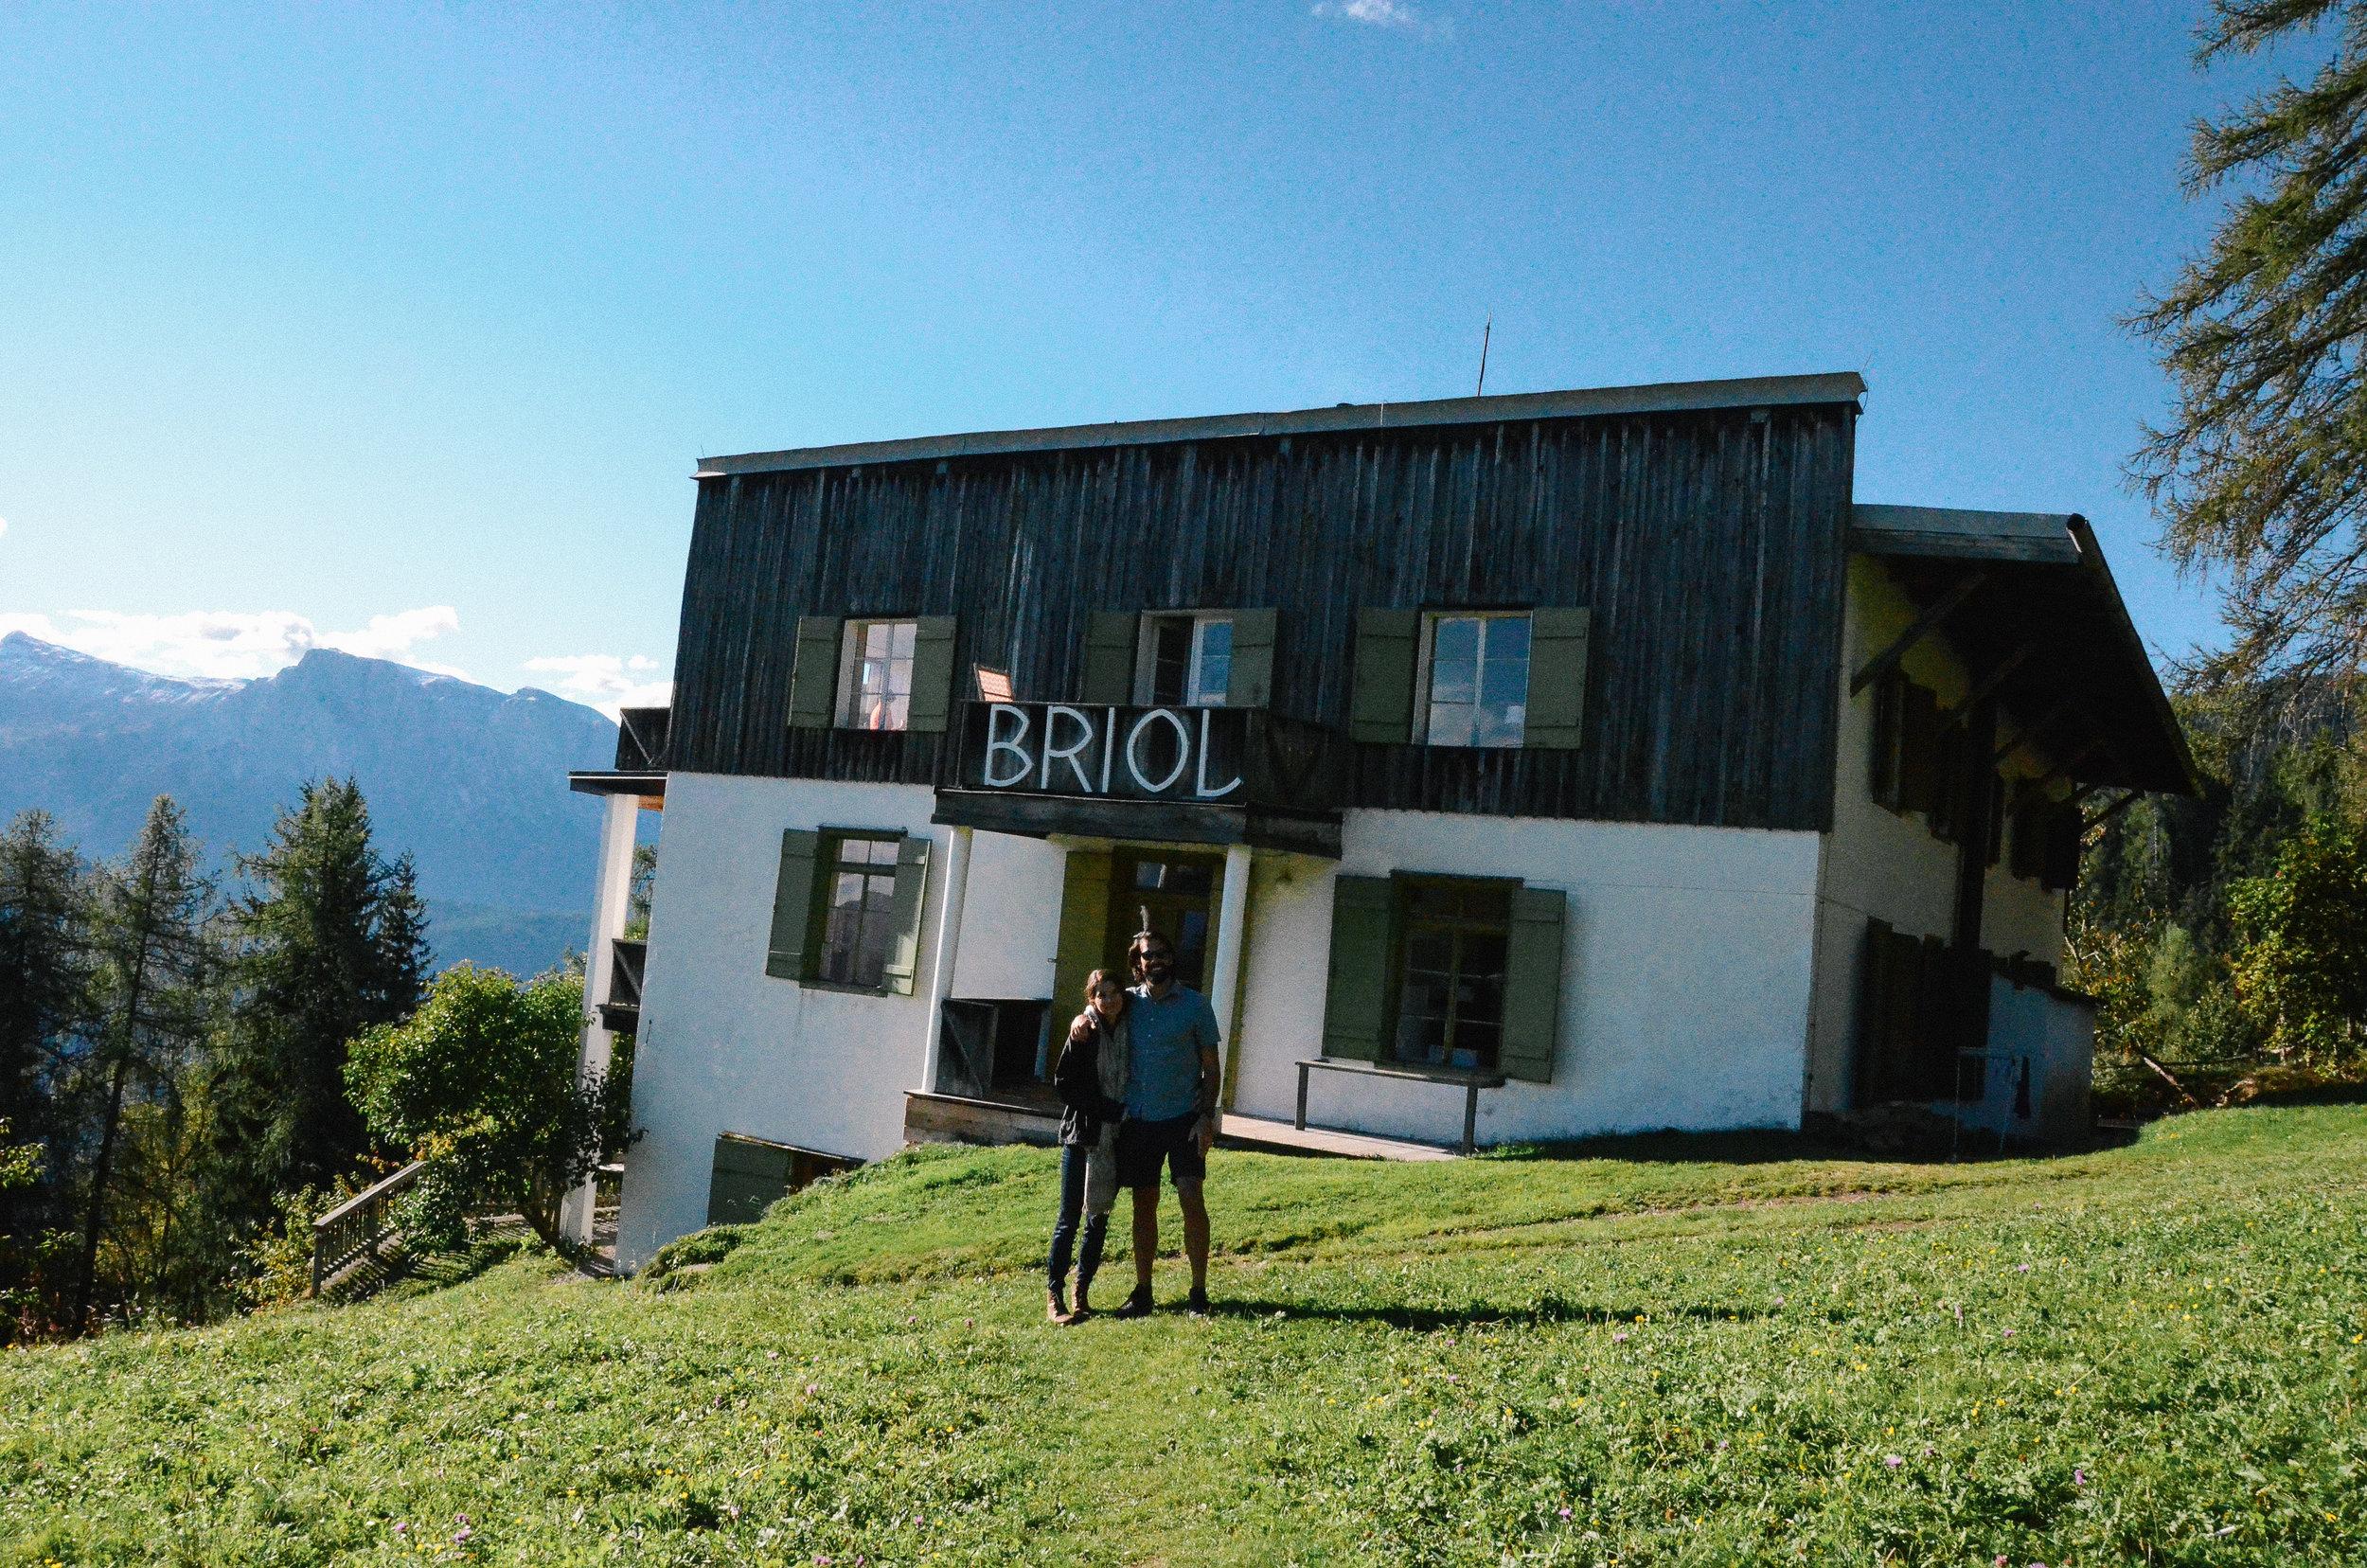 hotel_briol_dolomites_southtyrol_adventure_travel_blog_DSC_1518.jpg